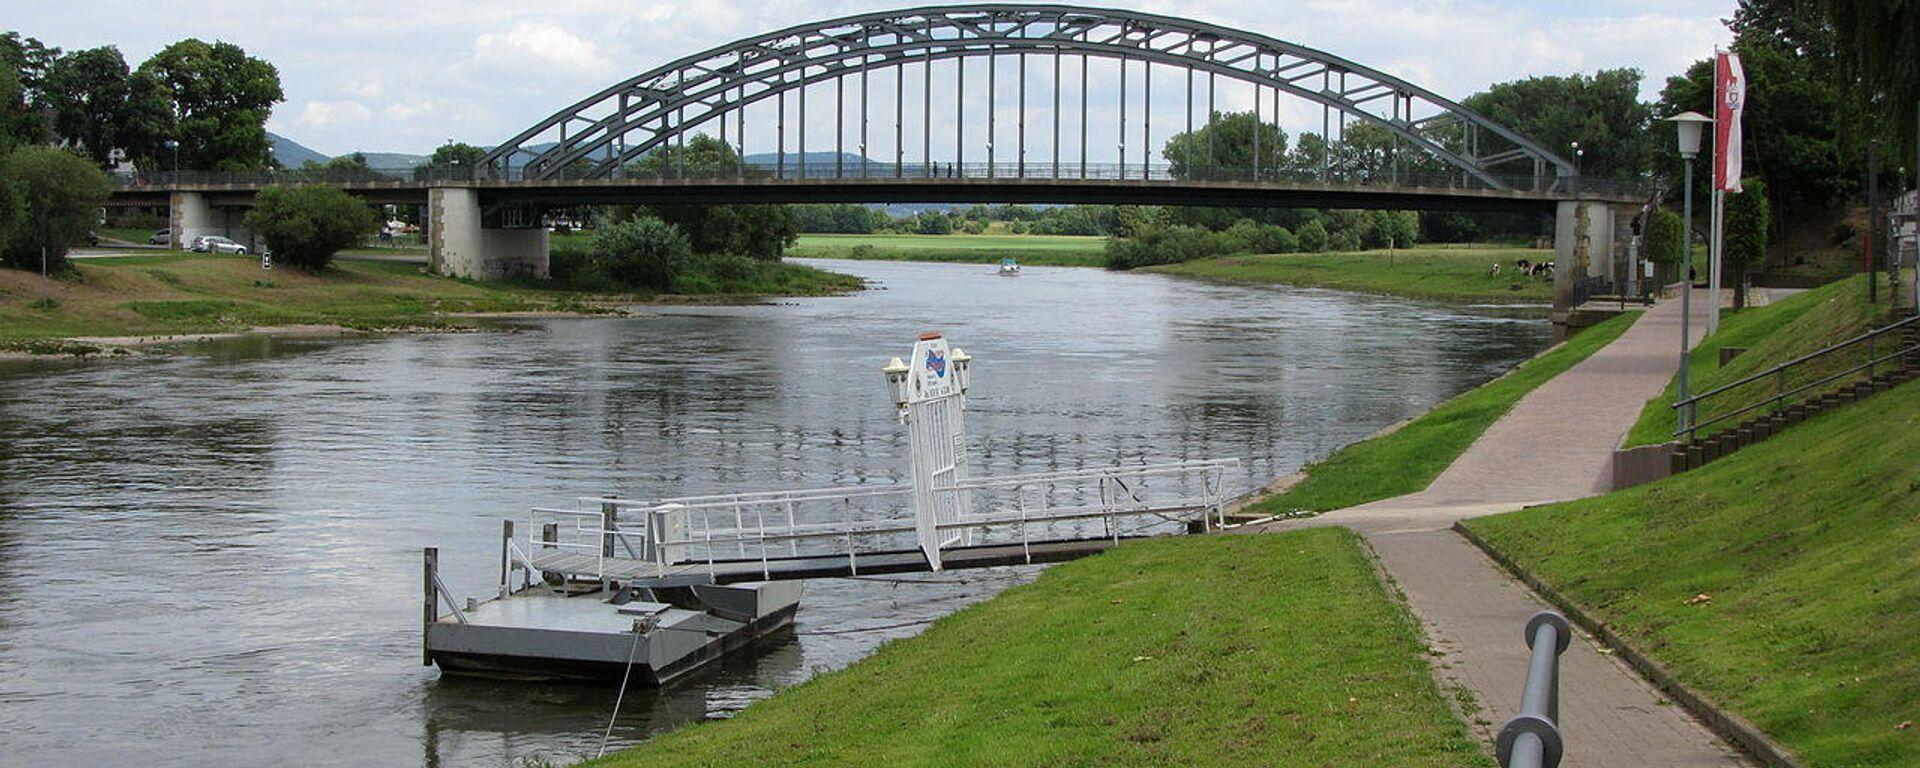 Hindenburgbrücke in Rinteln - SNA, 1920, 09.08.2021